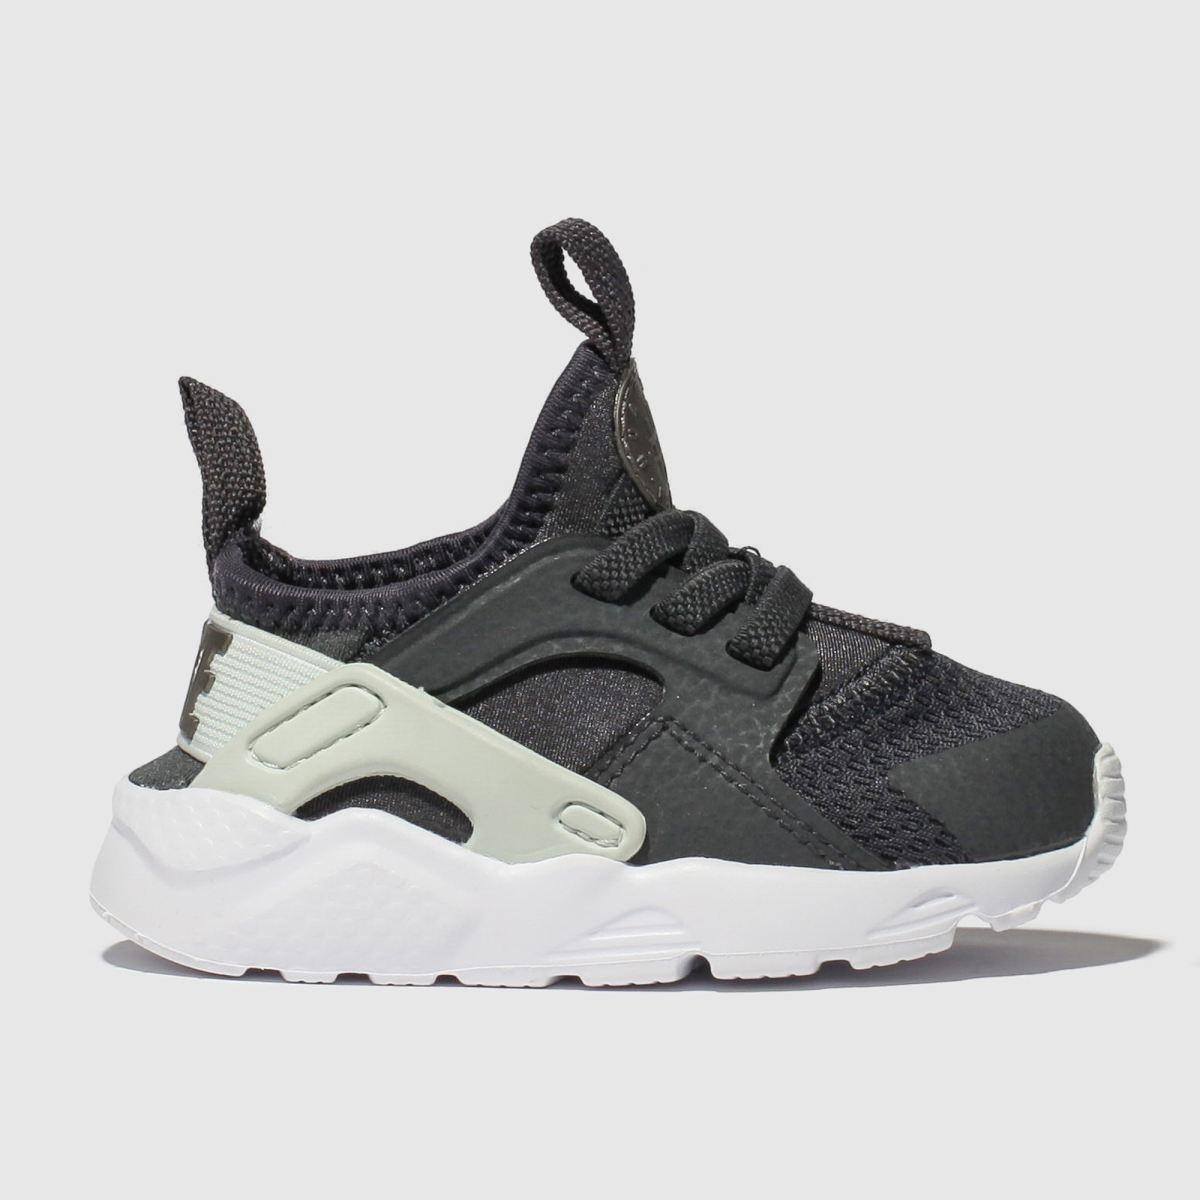 Nike Dark Grey Huarache Run Ultra Trainers Toddler